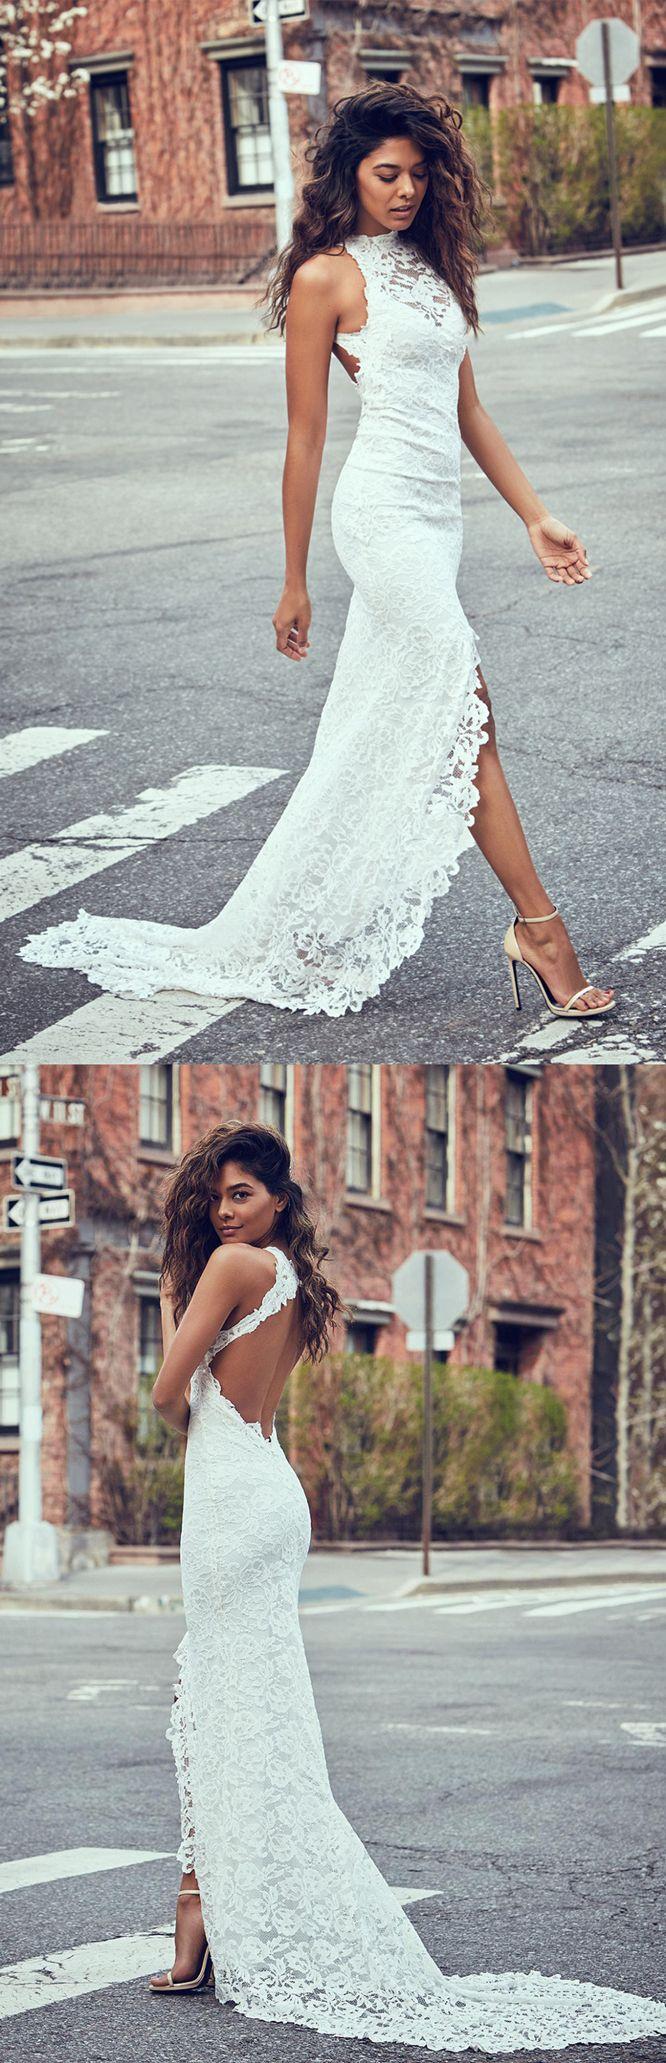 Mermaid lace wedding dressesopen back long bridal gowns simple